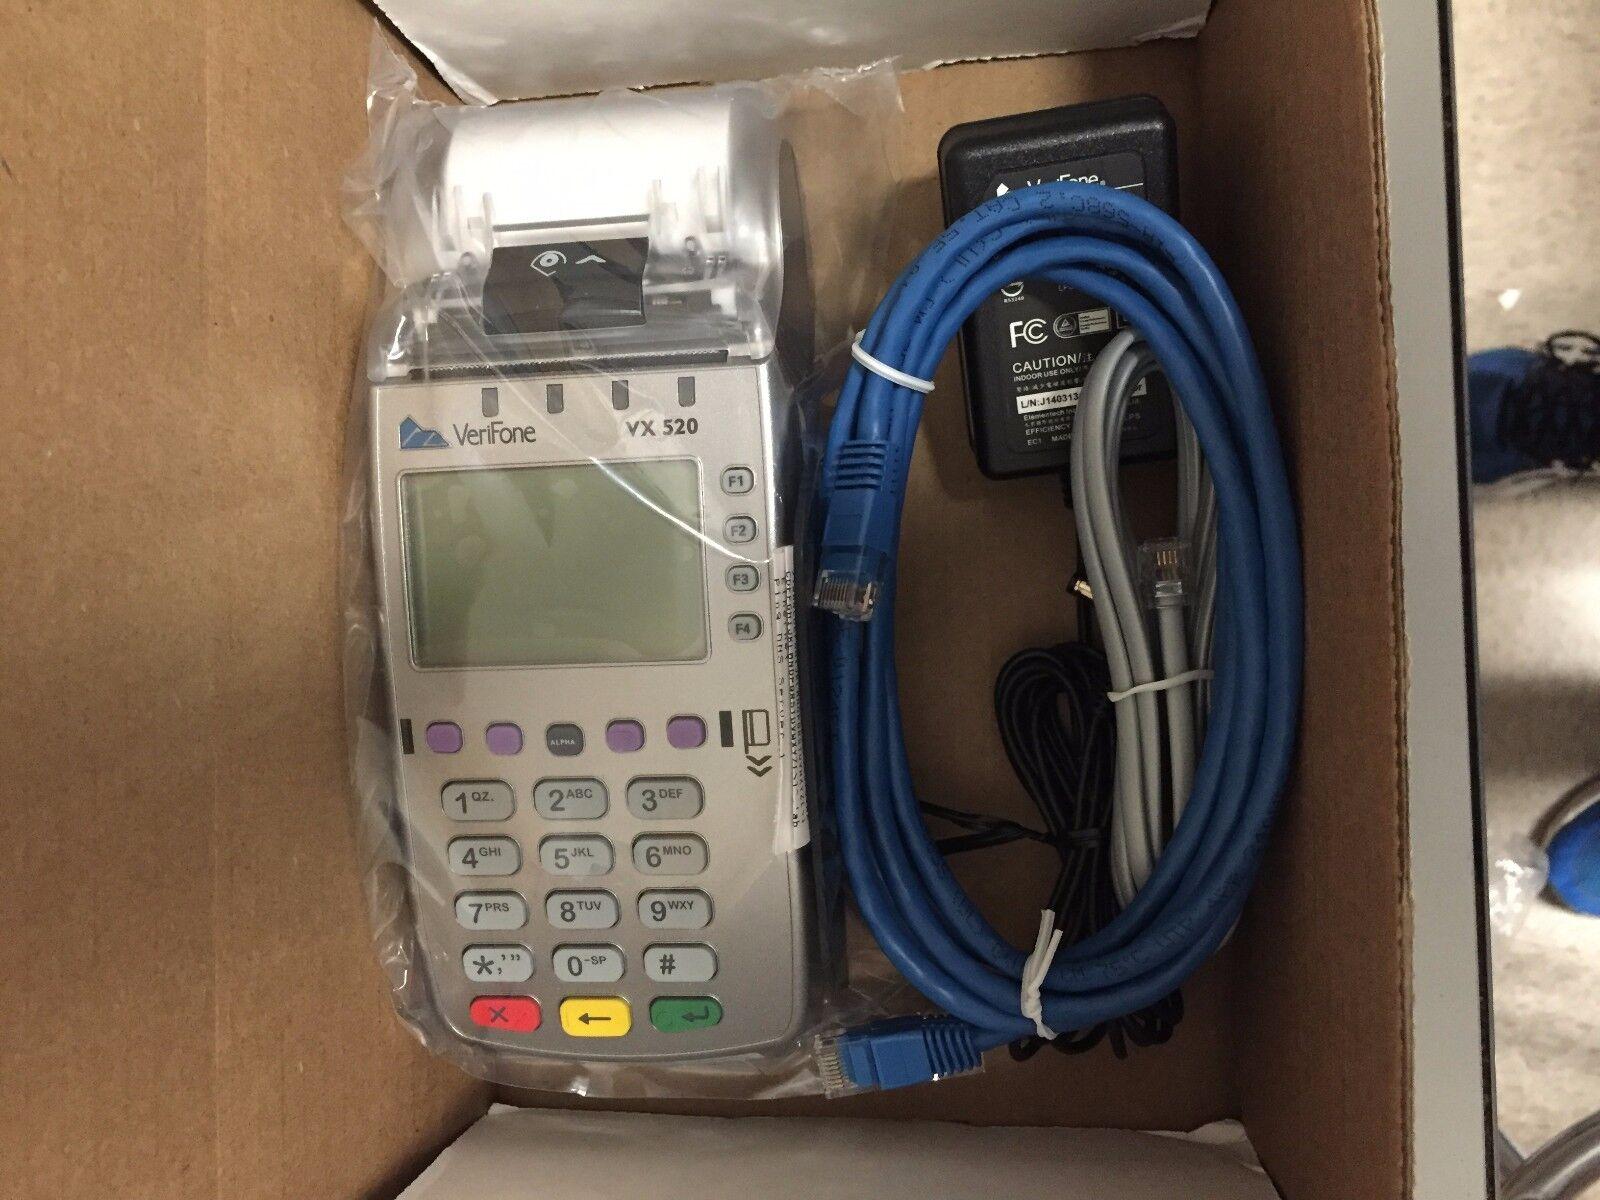 UPC 009969865224 - Verifone Vx 520 Ctls, Naa Dial/eth 128/32